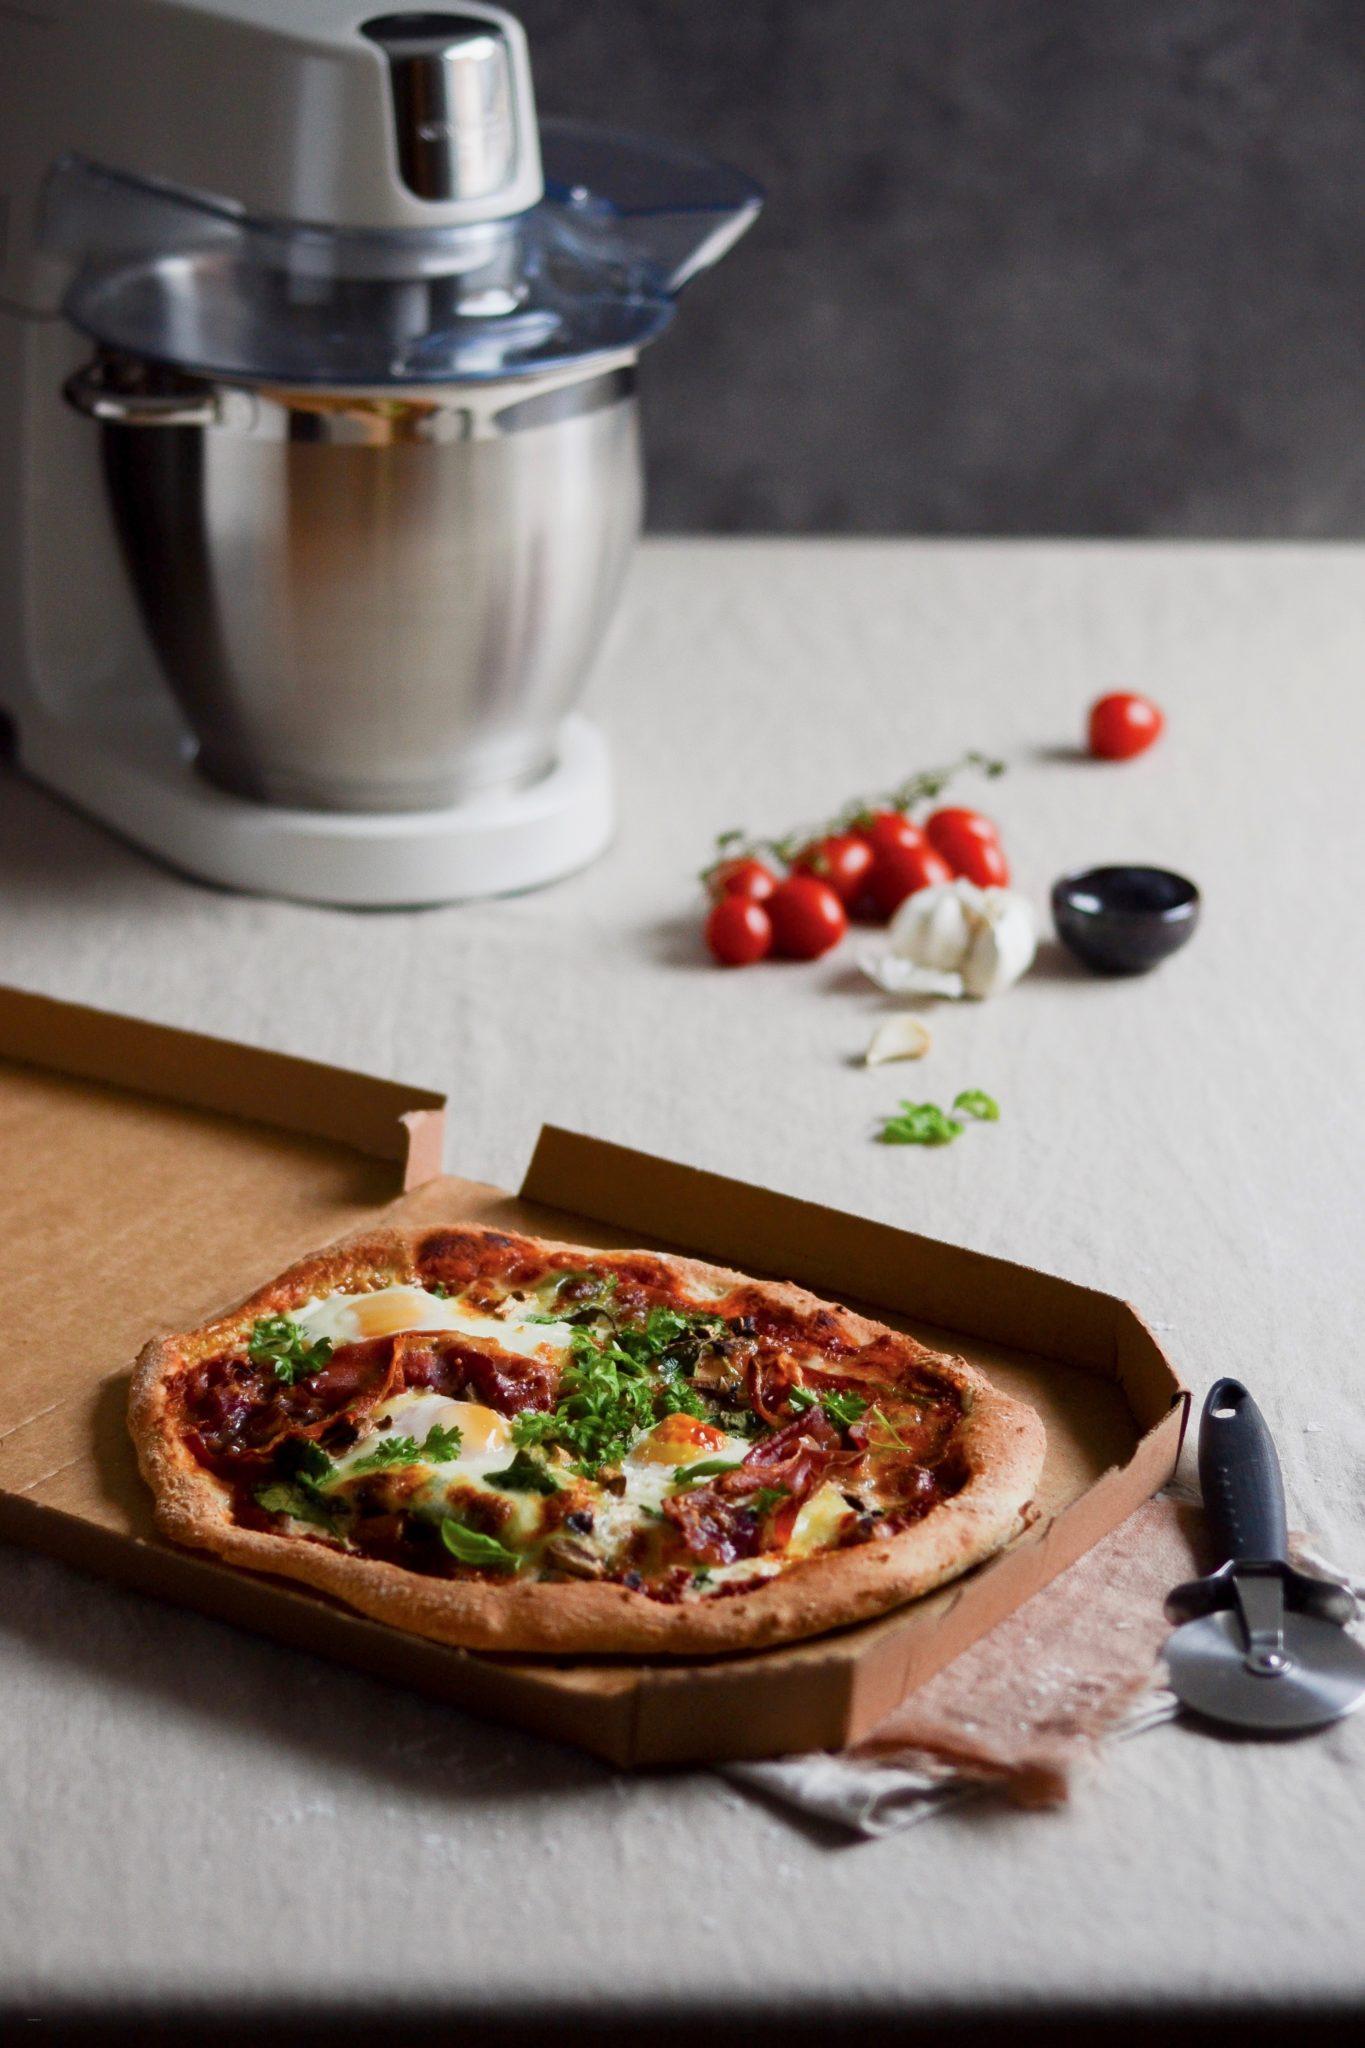 Morgenmadspizza med seranoskinke og æg